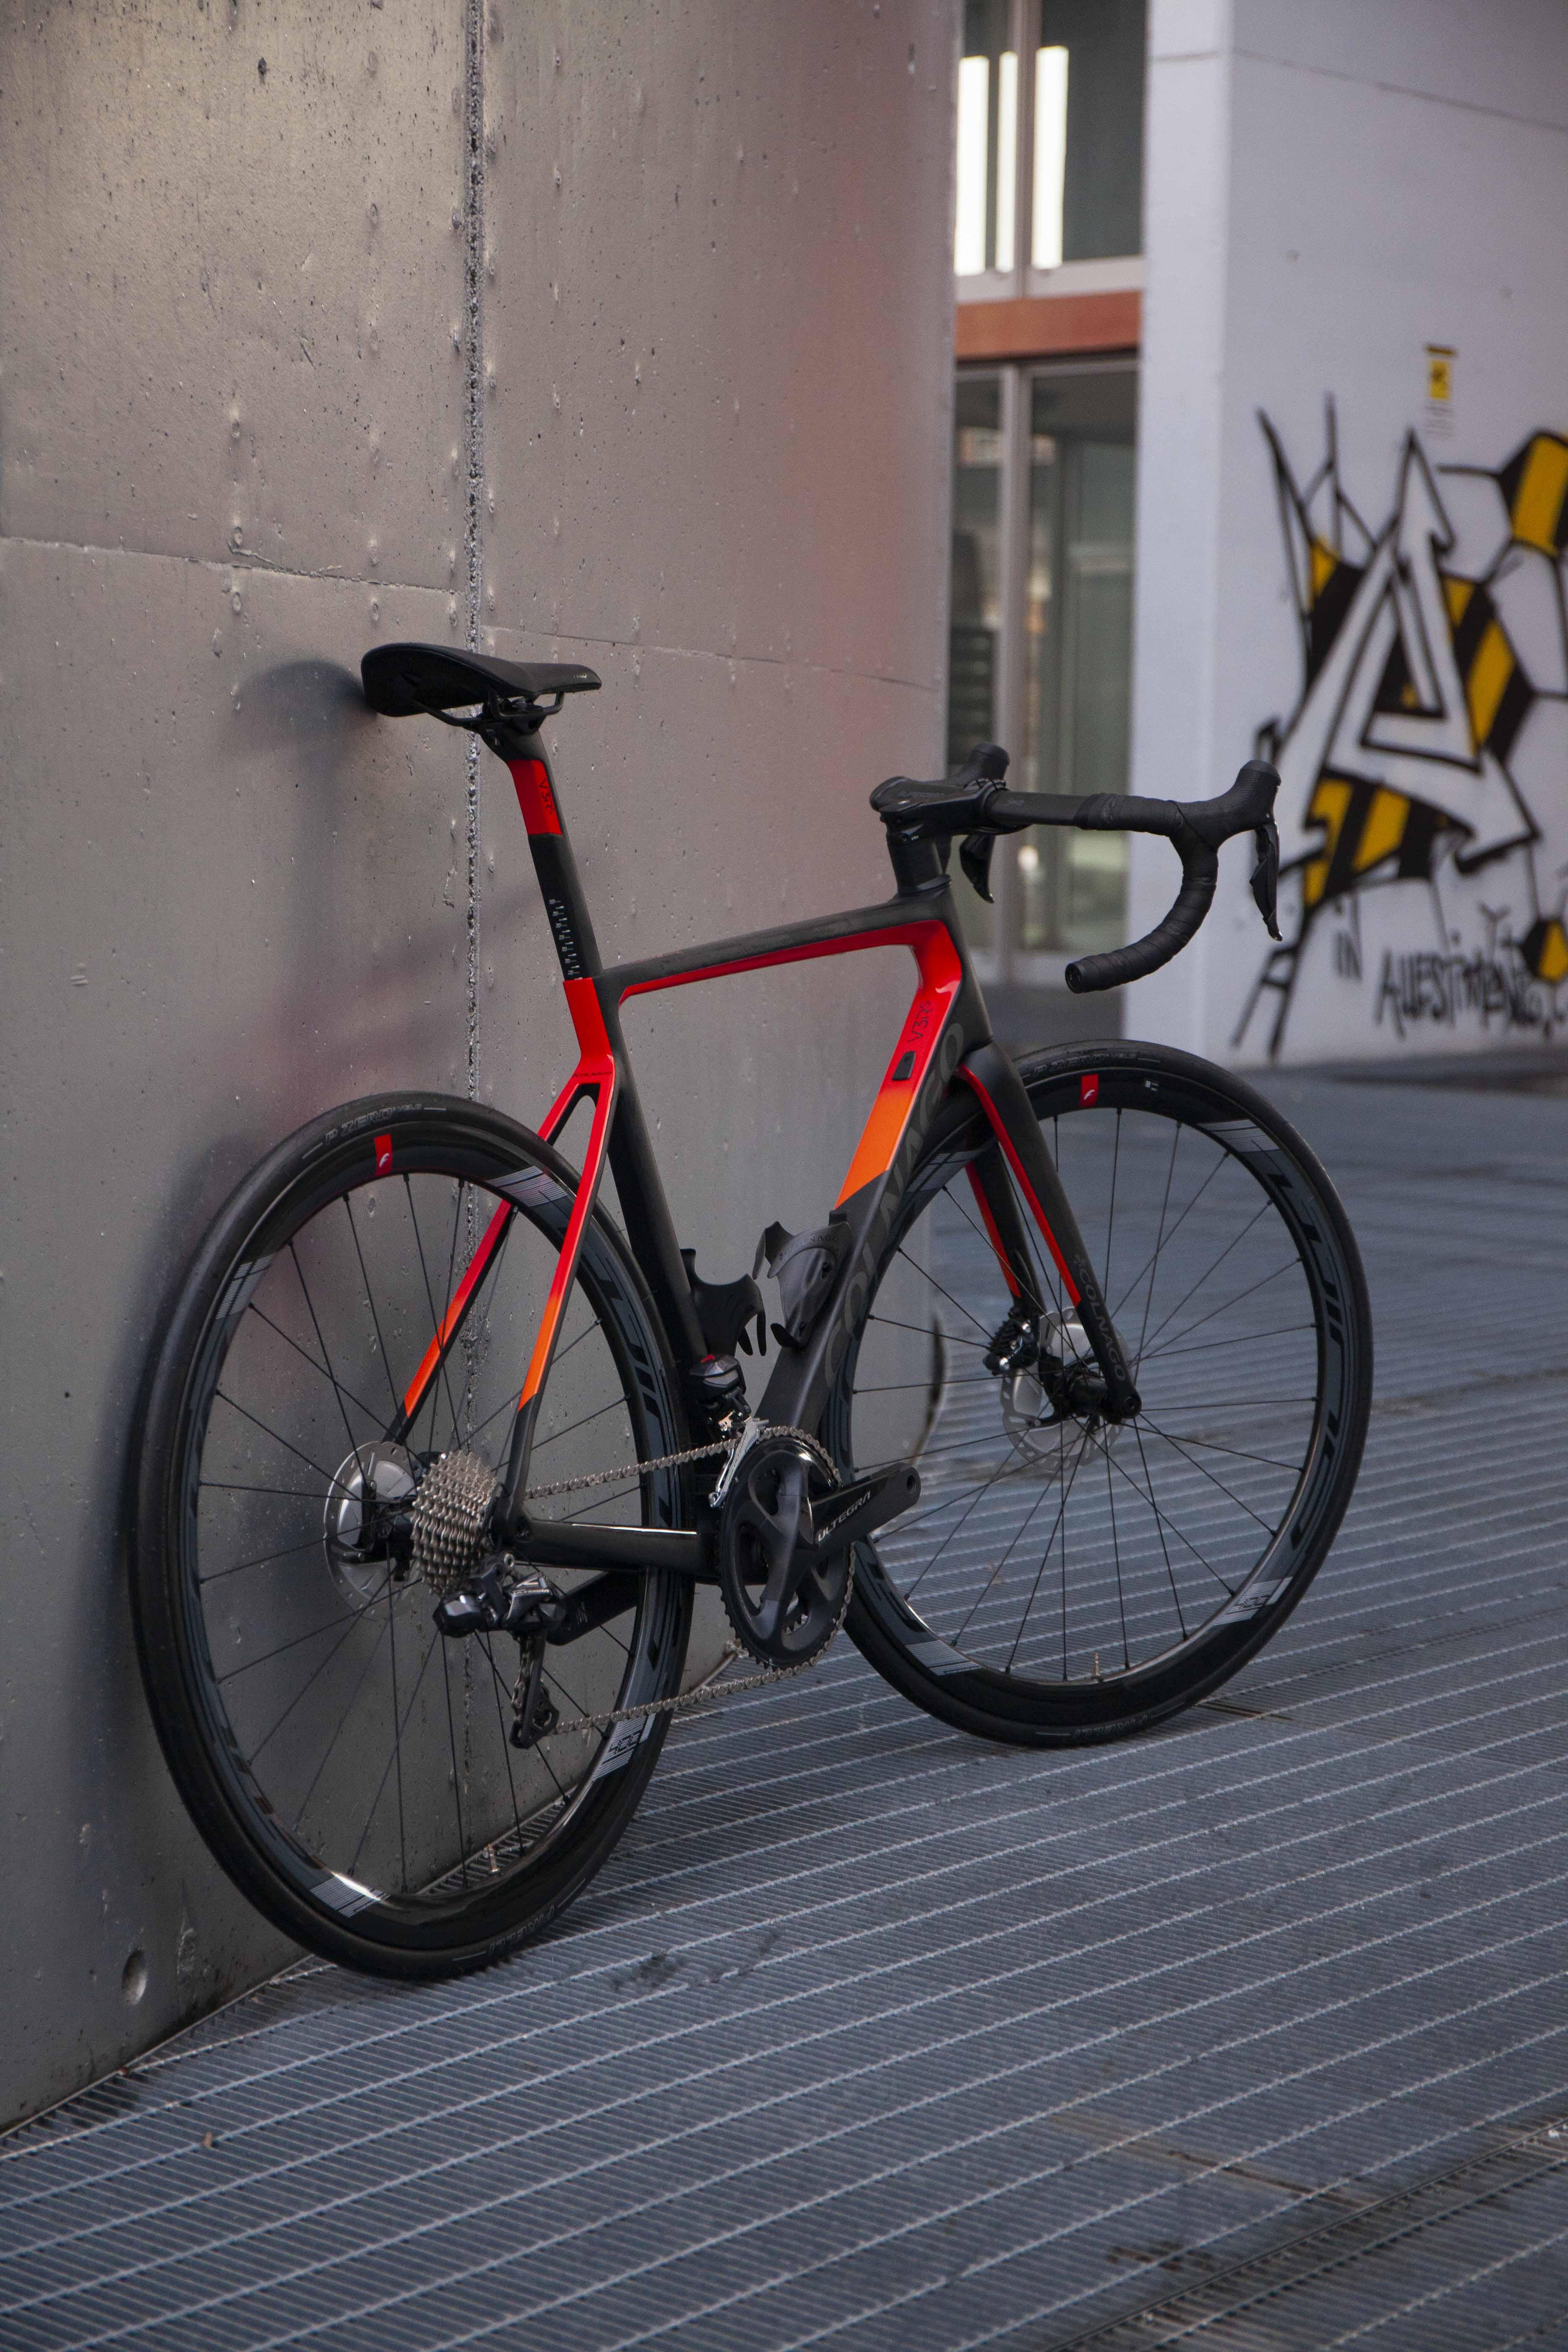 Cicli Corsa Colnago V3Rs 52s RZRD Ultegra Di2 Fulcrum Racing Wind 40_8